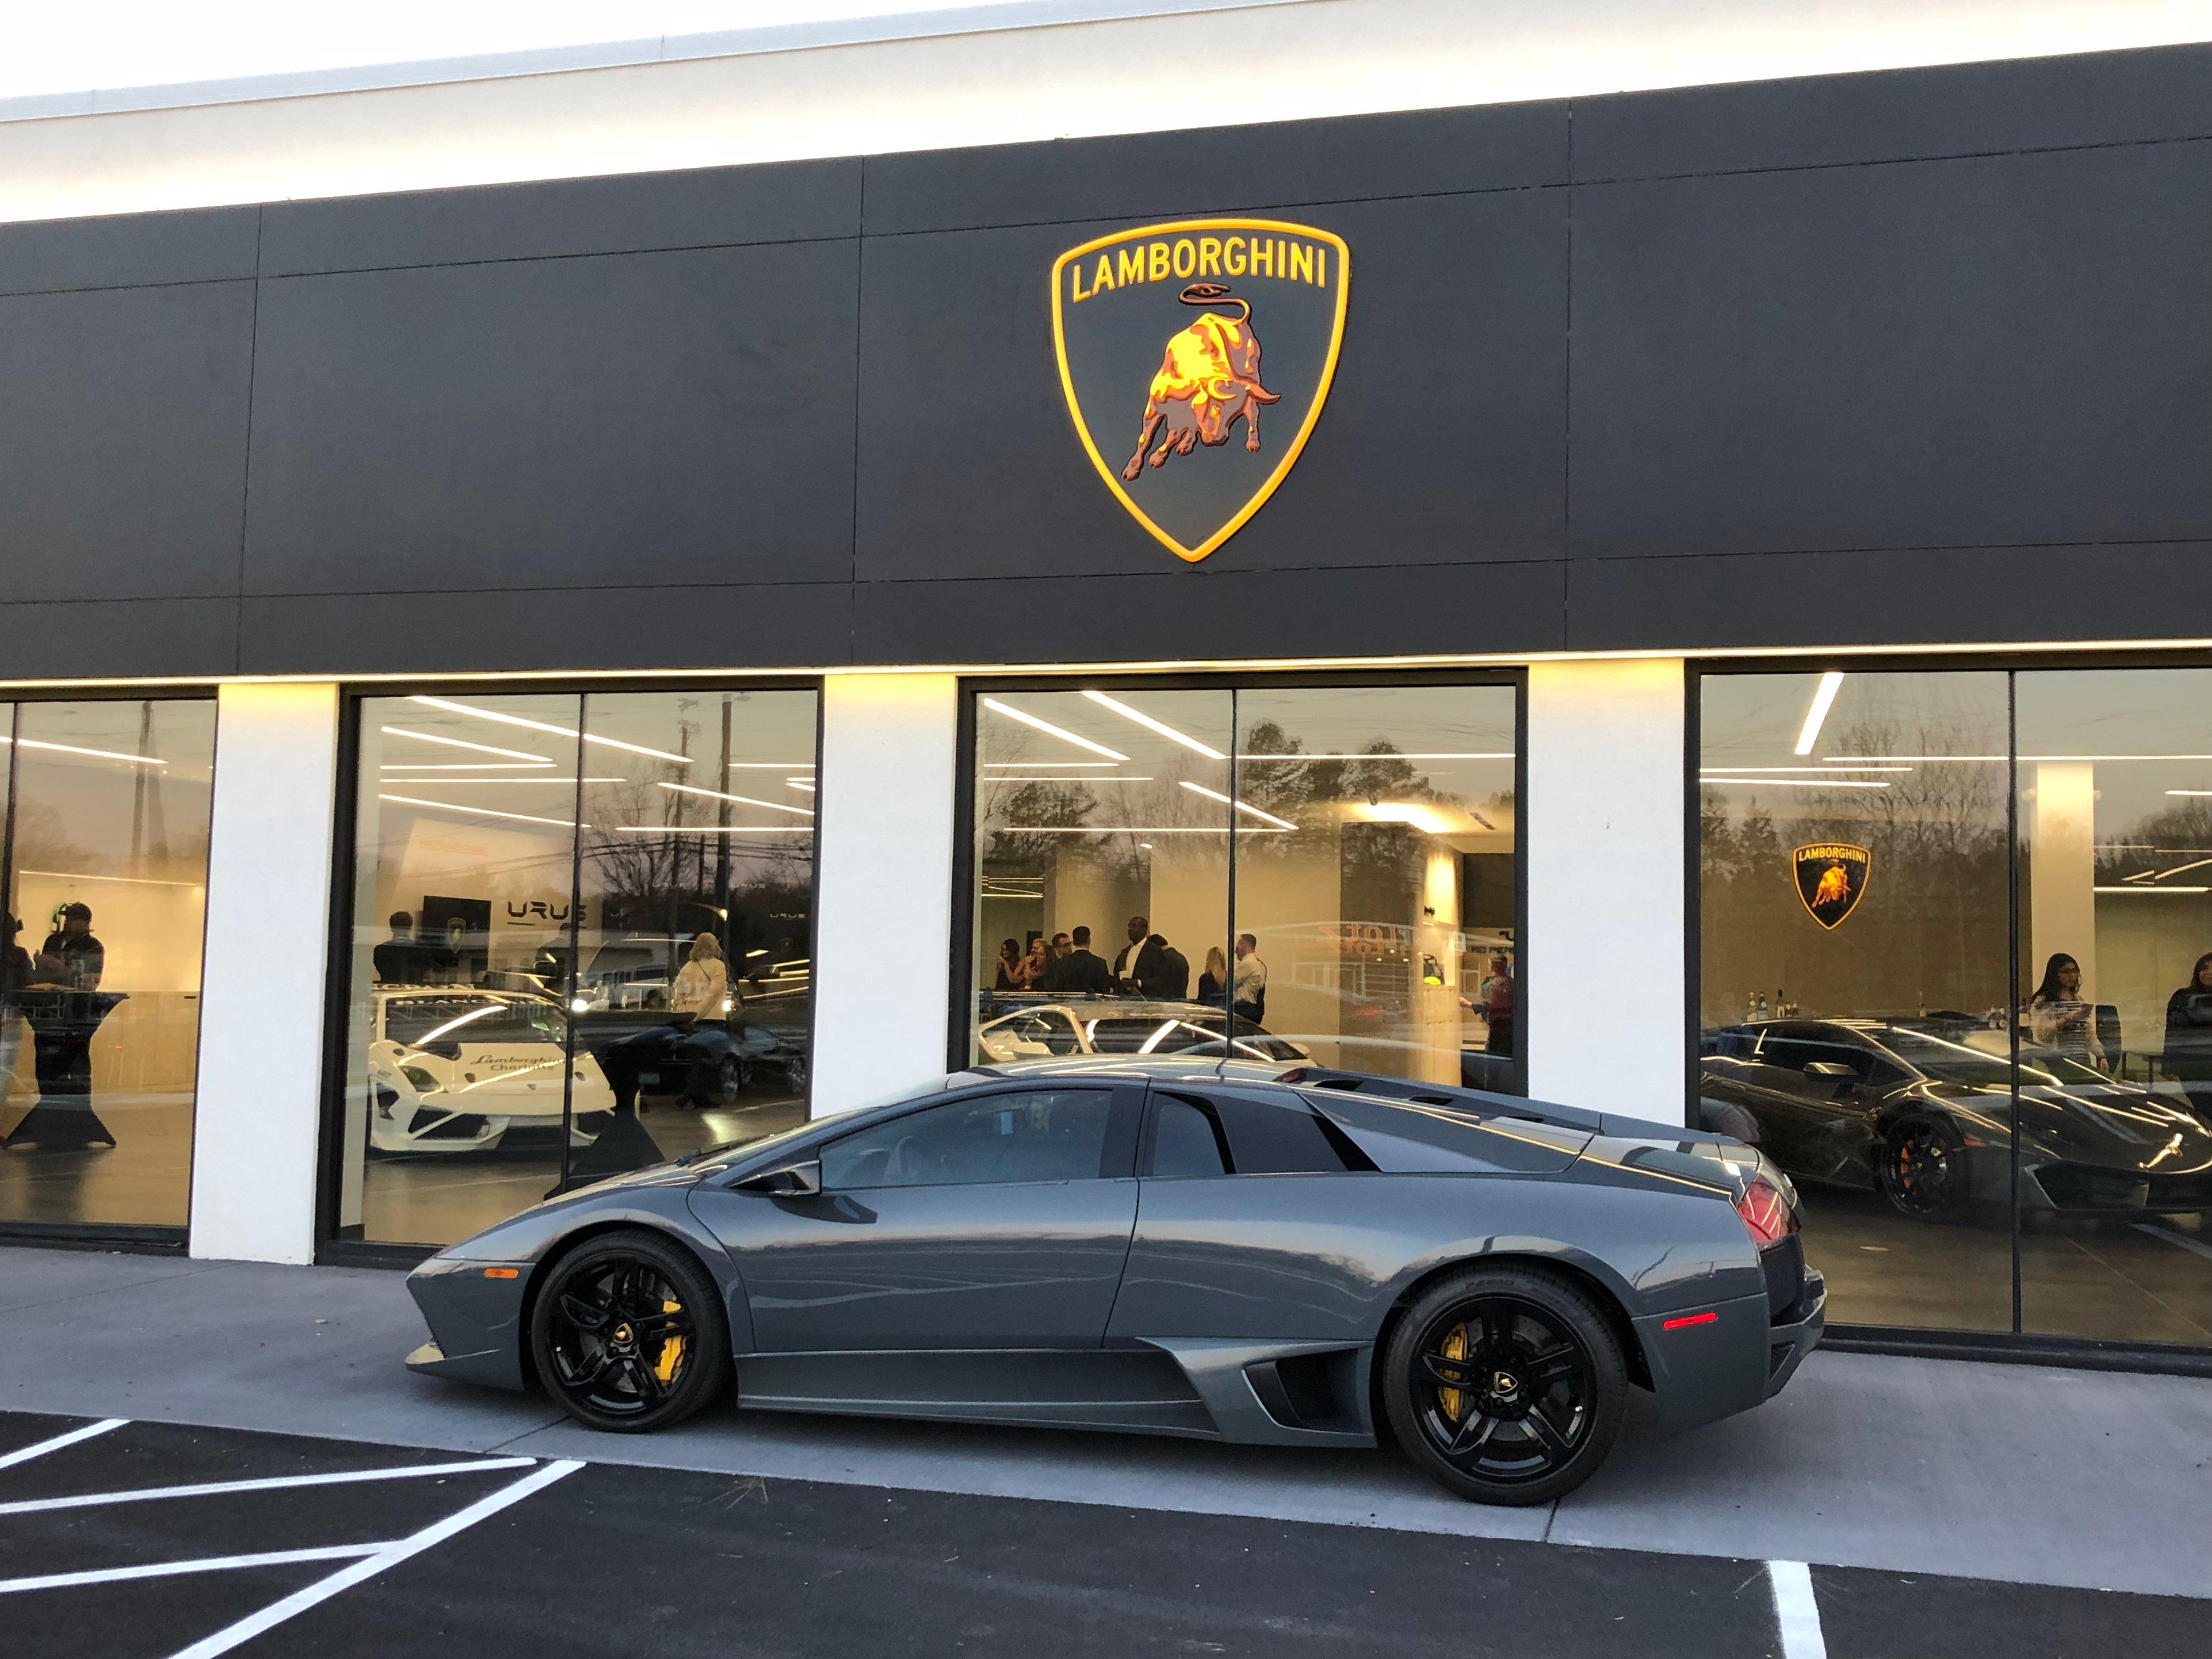 Ford Dealership Charlotte Nc >> Lamborghini Carolinas - Charlotte Opens Its Doors